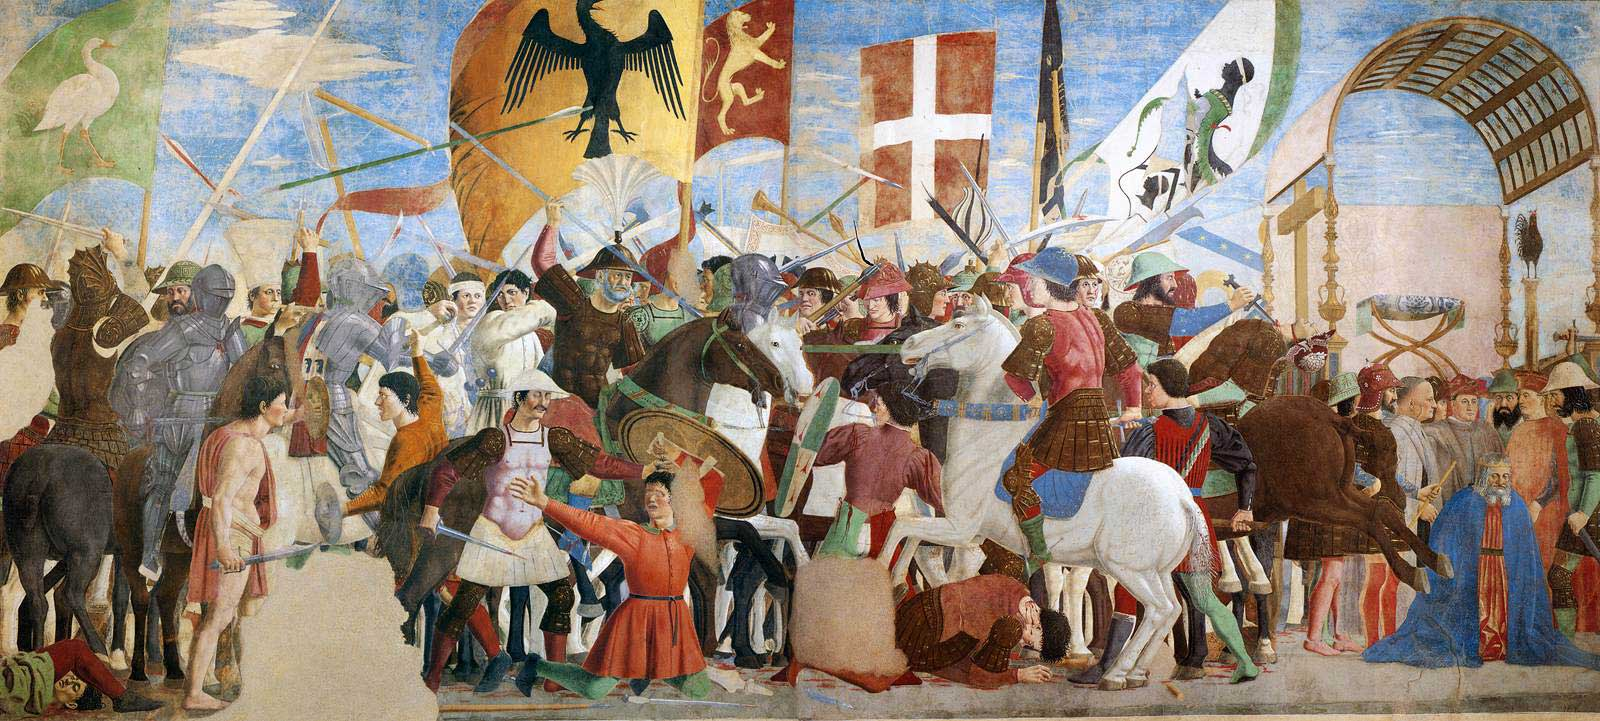 Piero della Francesca, raccontato con un docufilm